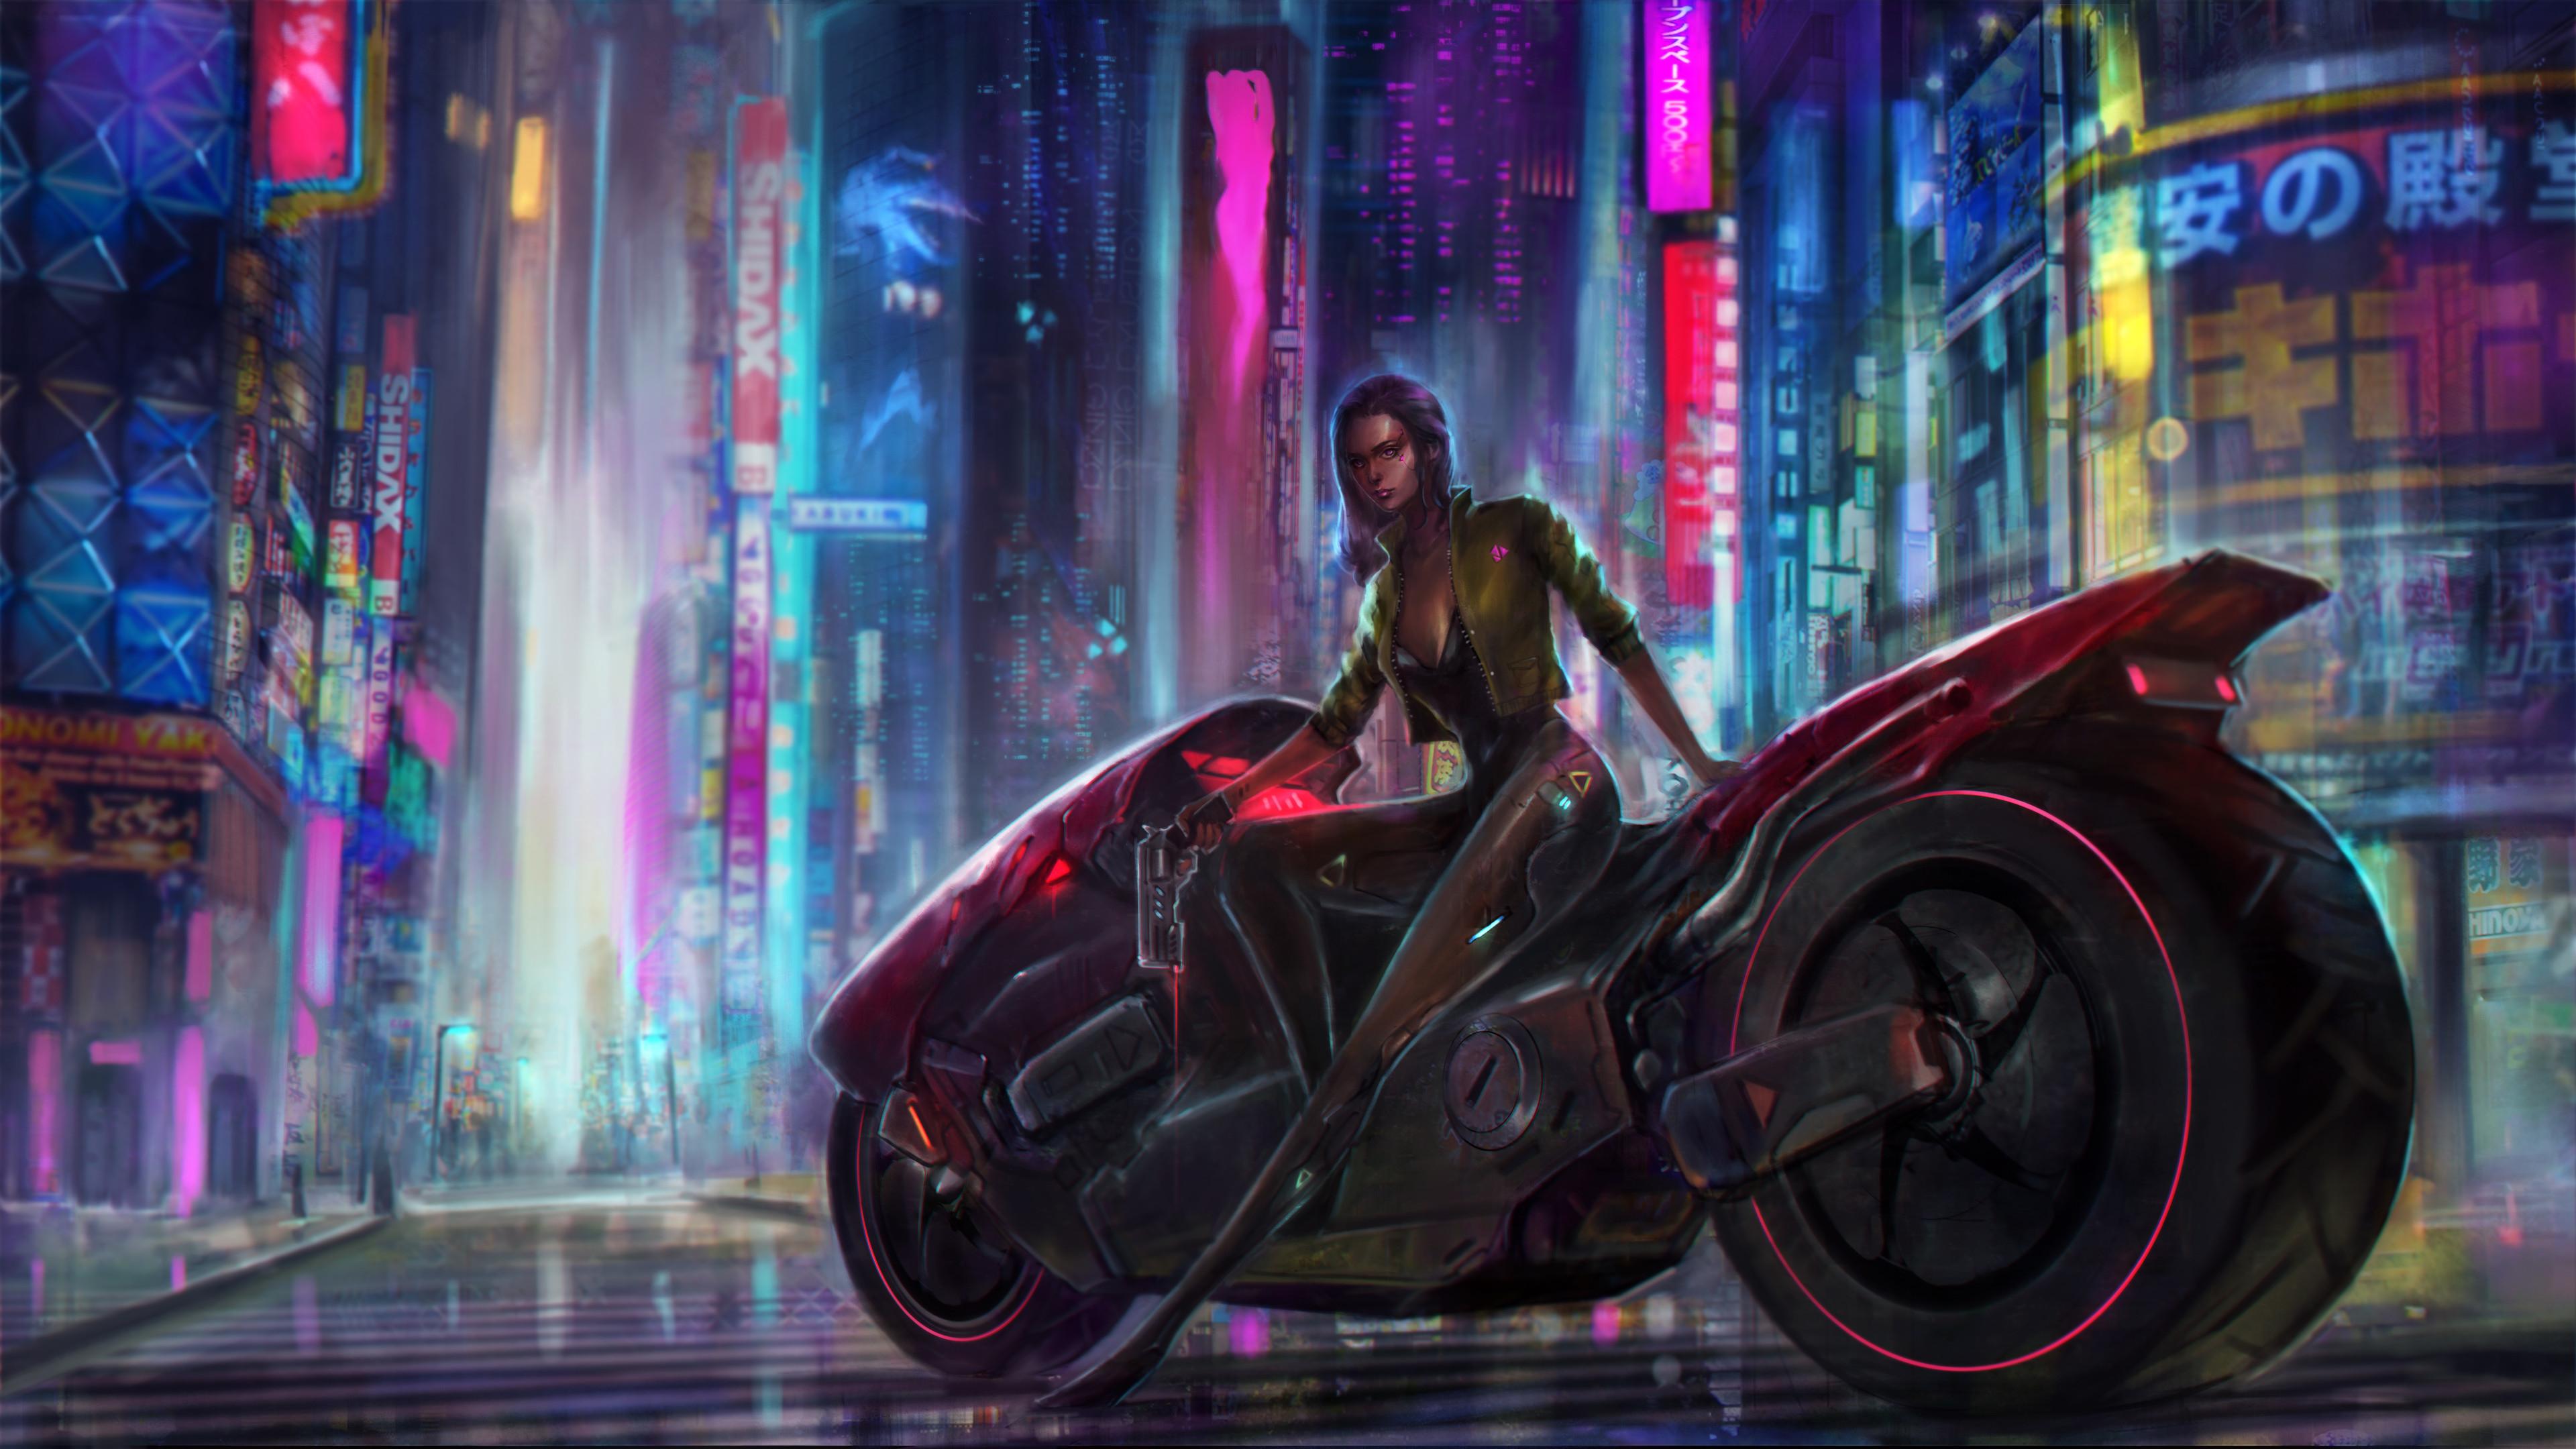 Cyberpunk Lonely Cyborg Illustration Wallpaper, HD Artist ...